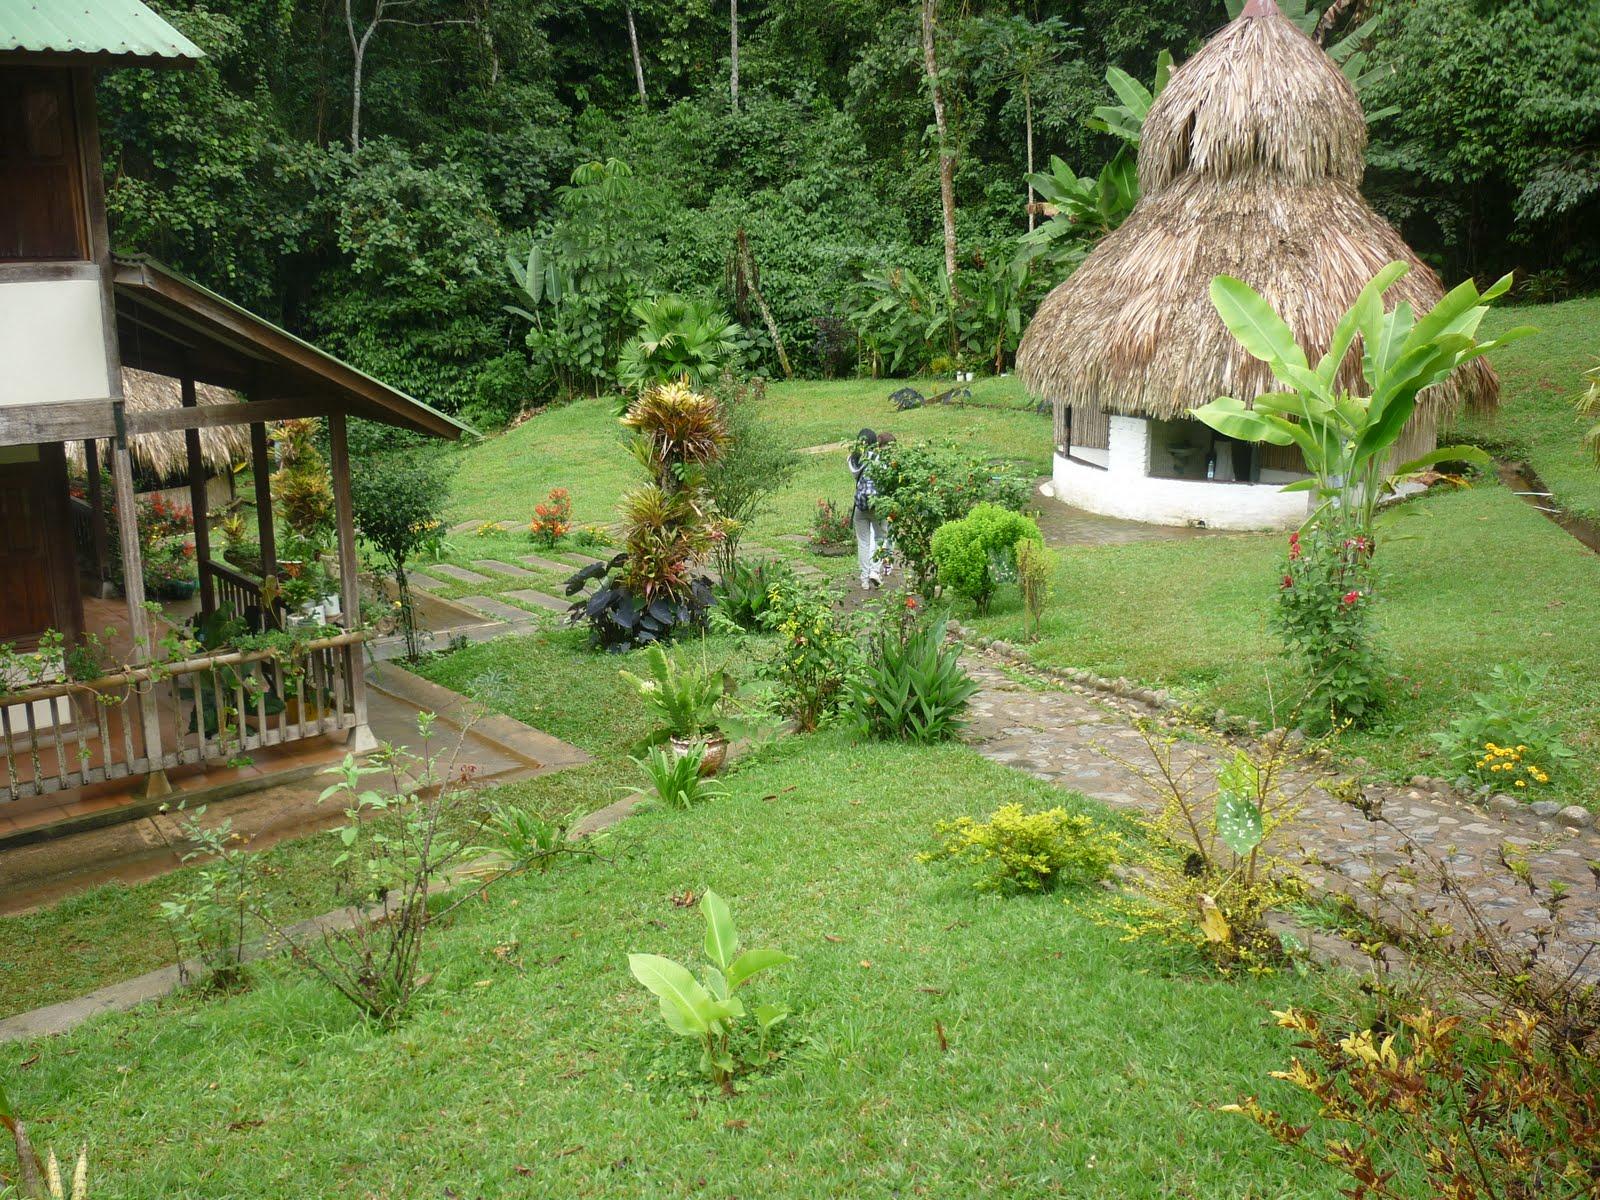 reserva natural bosque de yotoco